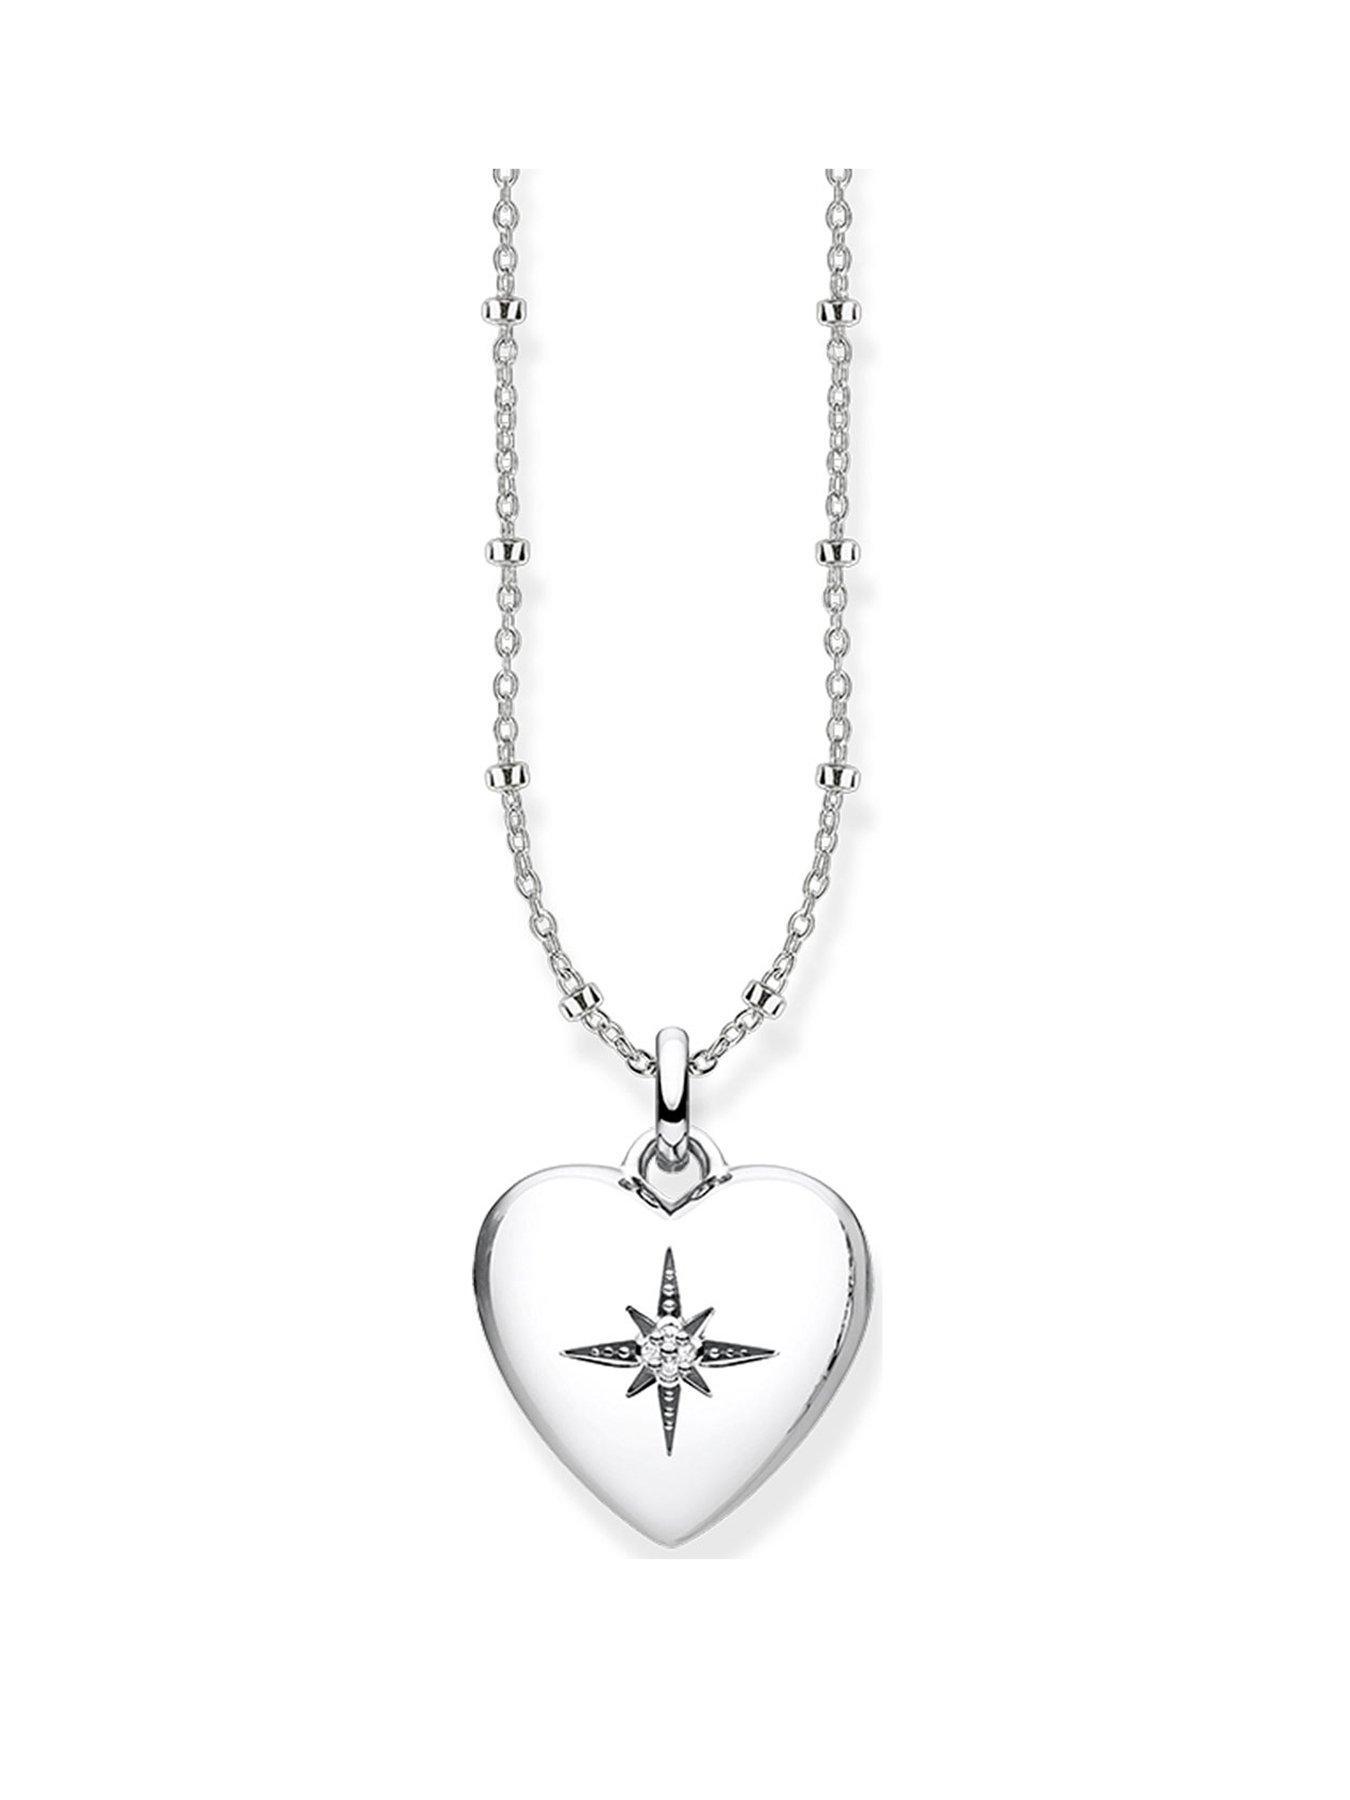 Faith 20mm Heart Locket Hope Sterling Silver Locket Jewelry Pendants /& Charms Opens 19.5 mm 25 mm Love